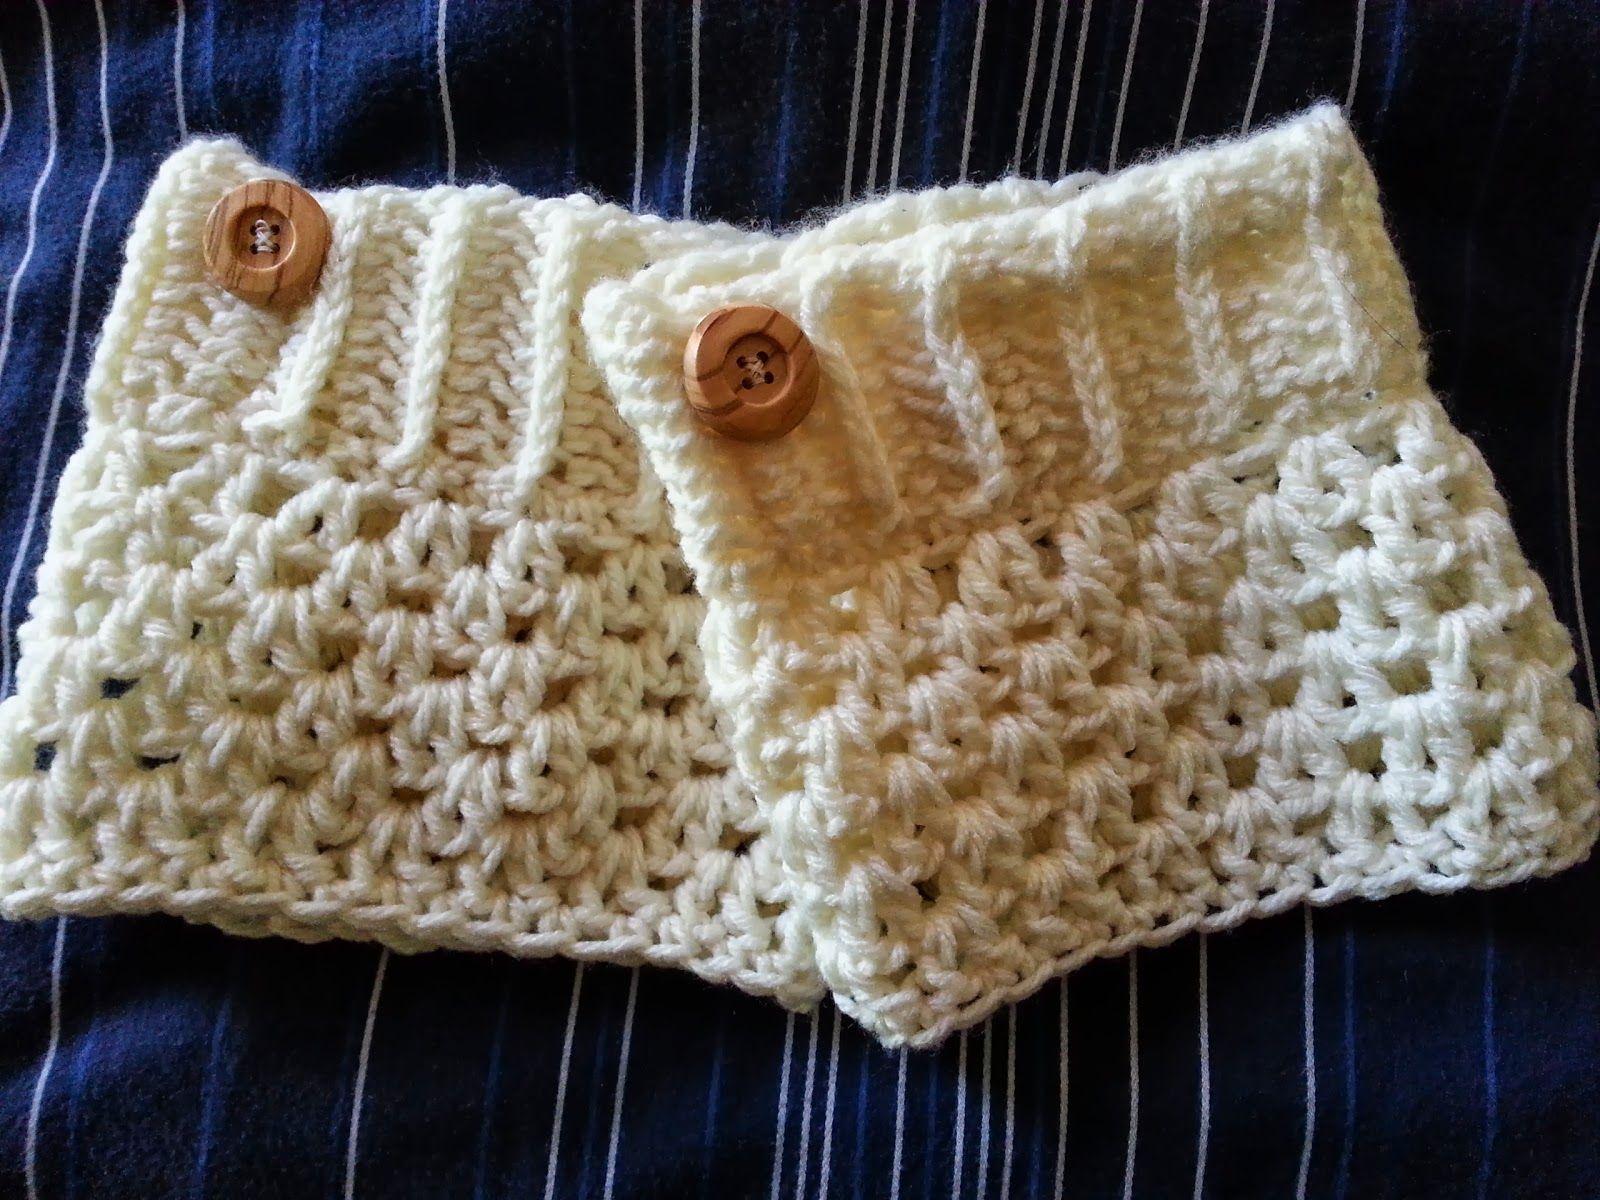 Crochet from j boot cuffs pattern crochet pinterest crochet list of free patterns to crochet boot cuffs crochet pattern free bankloansurffo Images